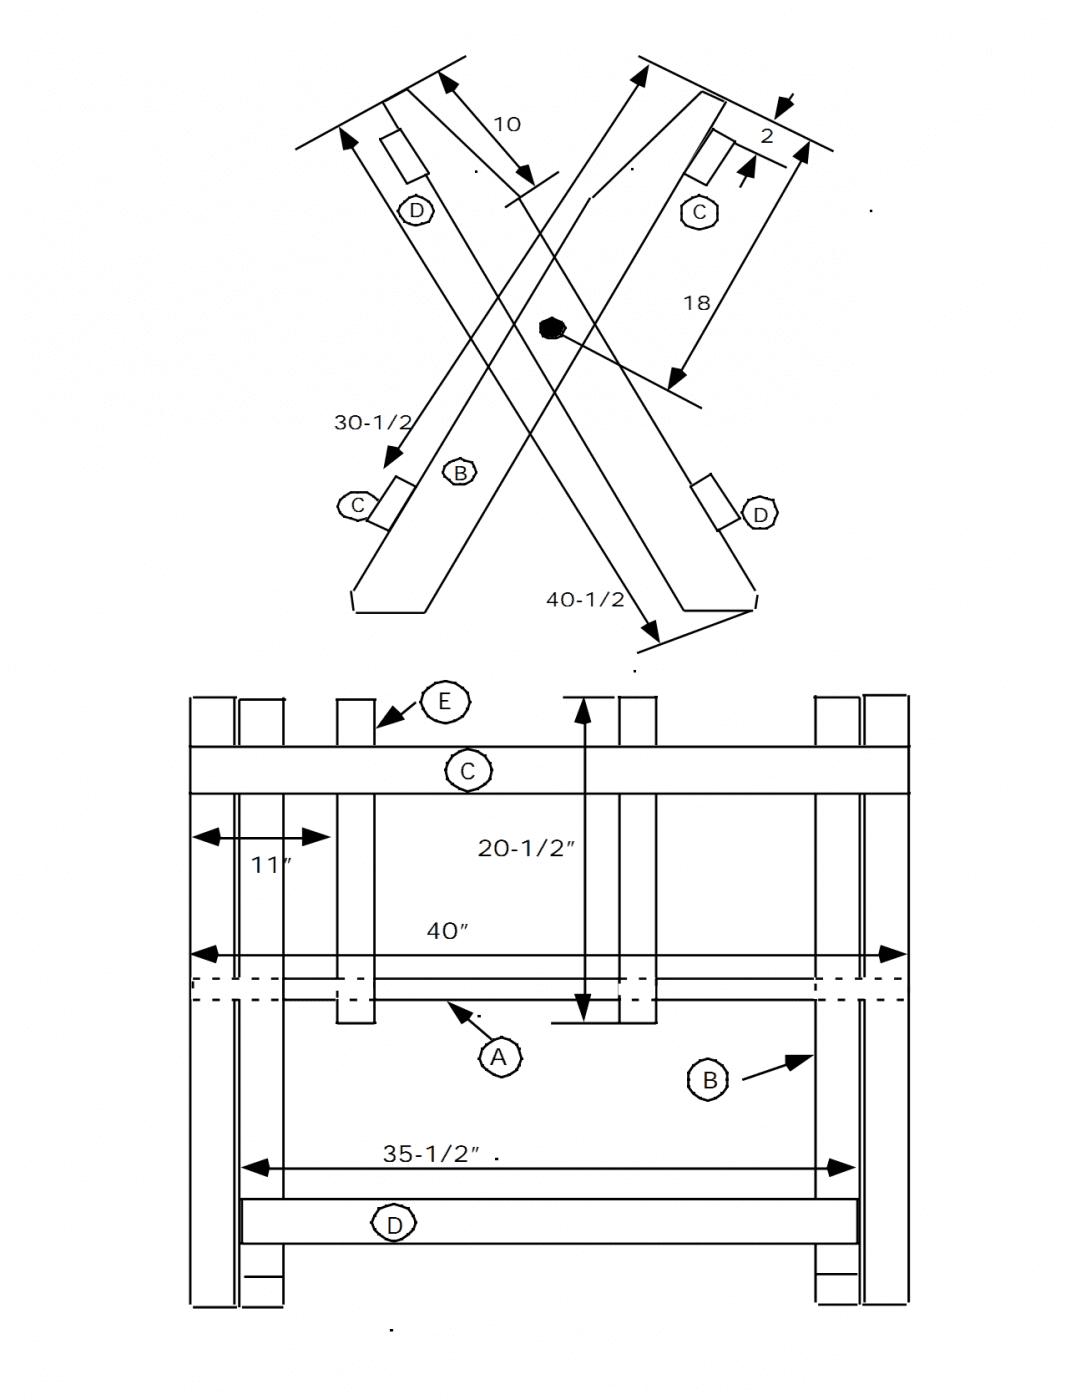 Woodwork Build a folding sawbuck Plans PDF Download Free Build A Corner Liquor Cabinet – A Step ...